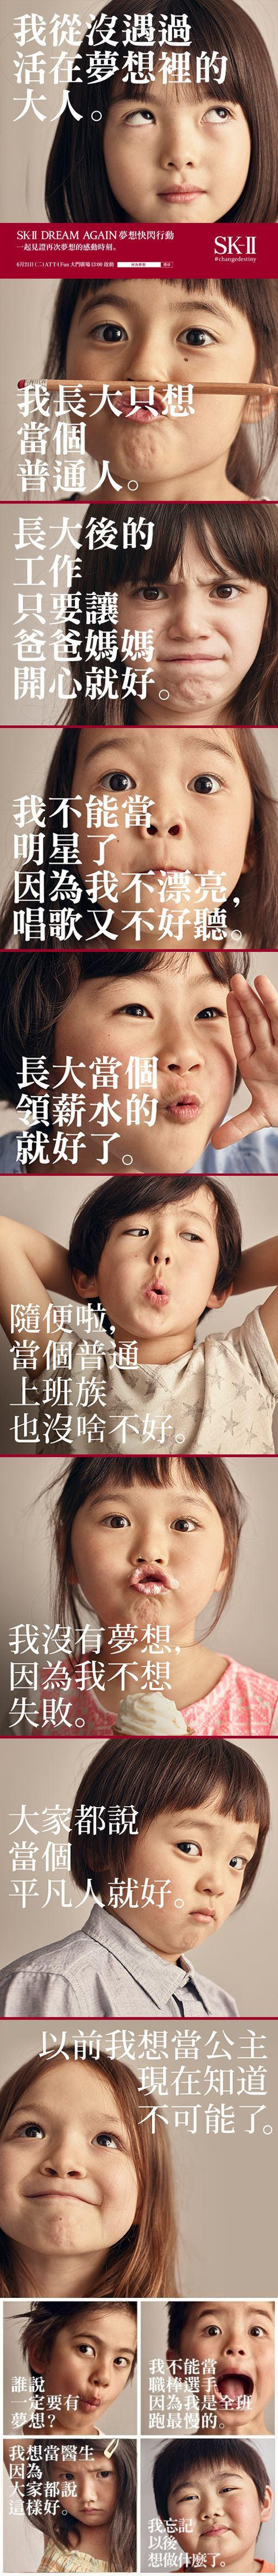 SK-II #Dream Again 夢想快閃行動 #文案